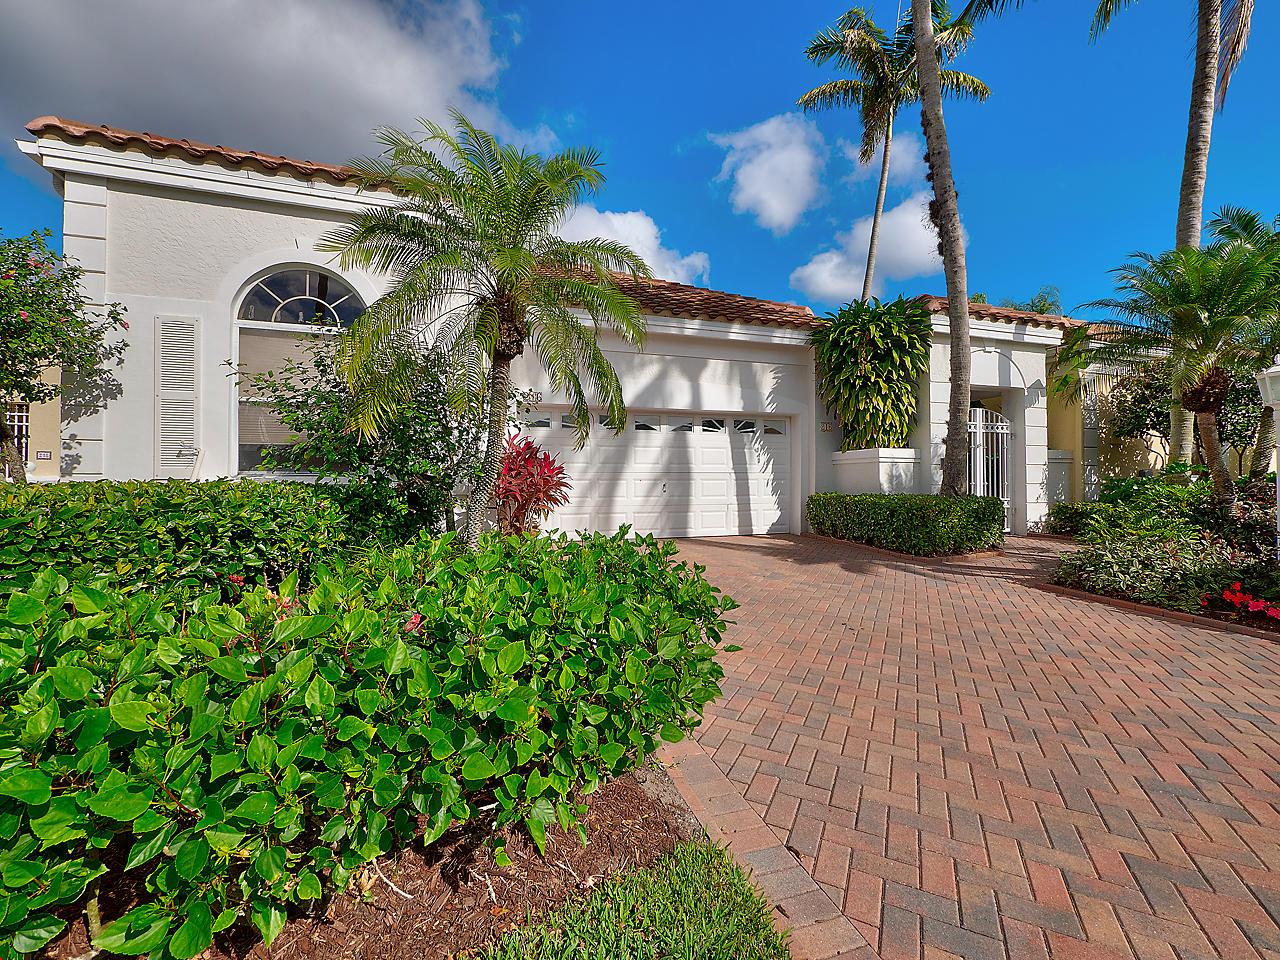 216 Coral Cay Terrace, Palm Beach Gardens, Florida 33418, 3 Bedrooms Bedrooms, ,3 BathroomsBathrooms,A,Single family,Coral Cay,RX-10591527